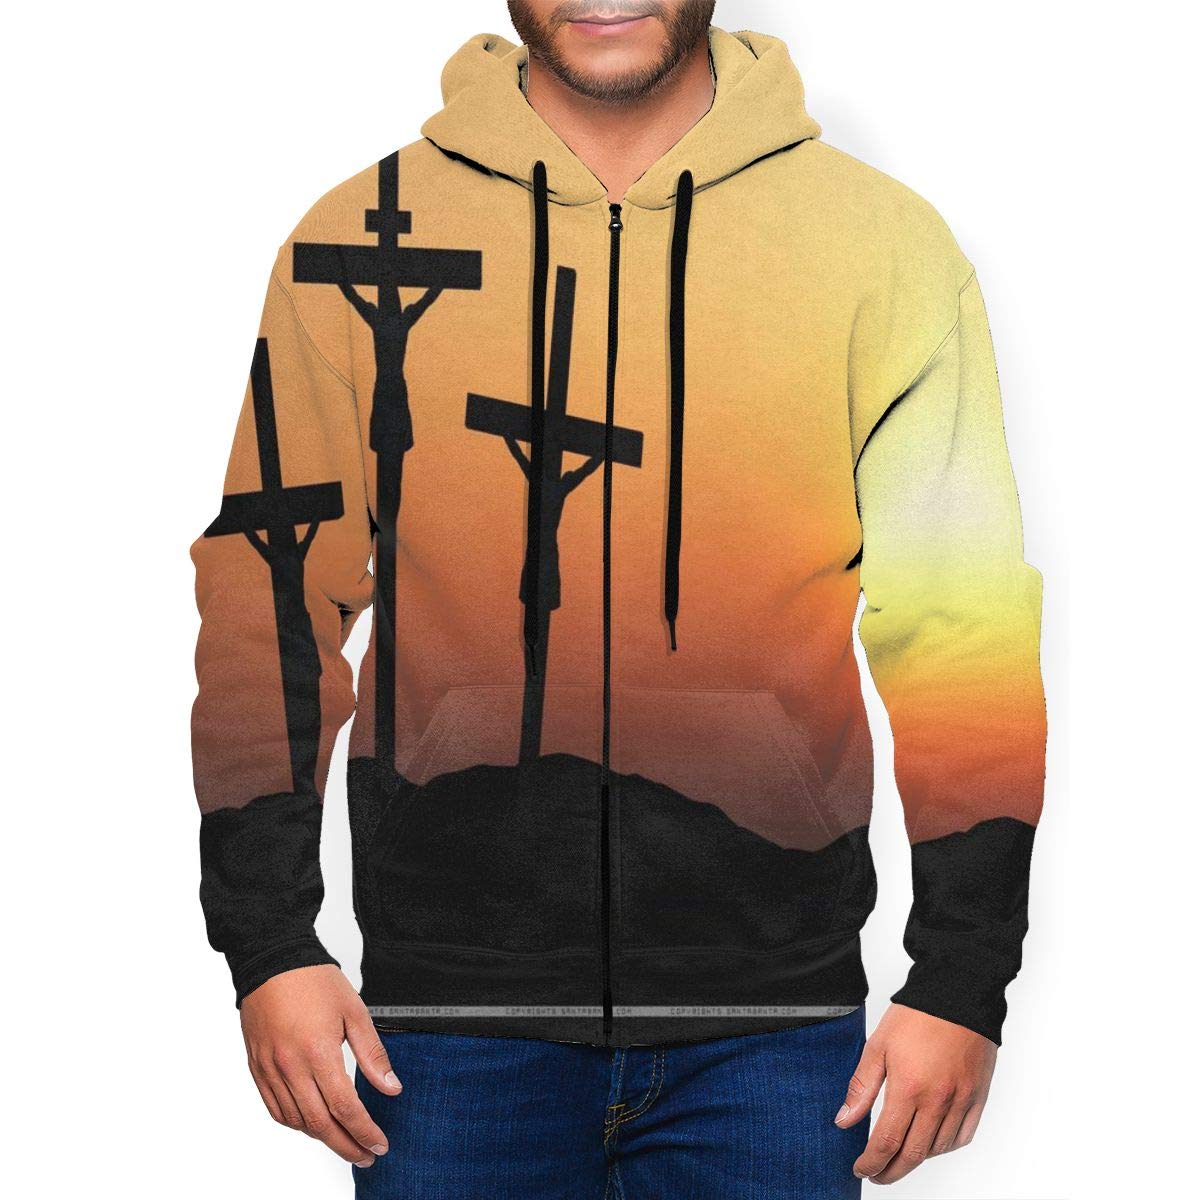 Surf/&Nee Capricorn Constellation Mens Hoodie Pullover Fleece Sweatshirt with Pocket